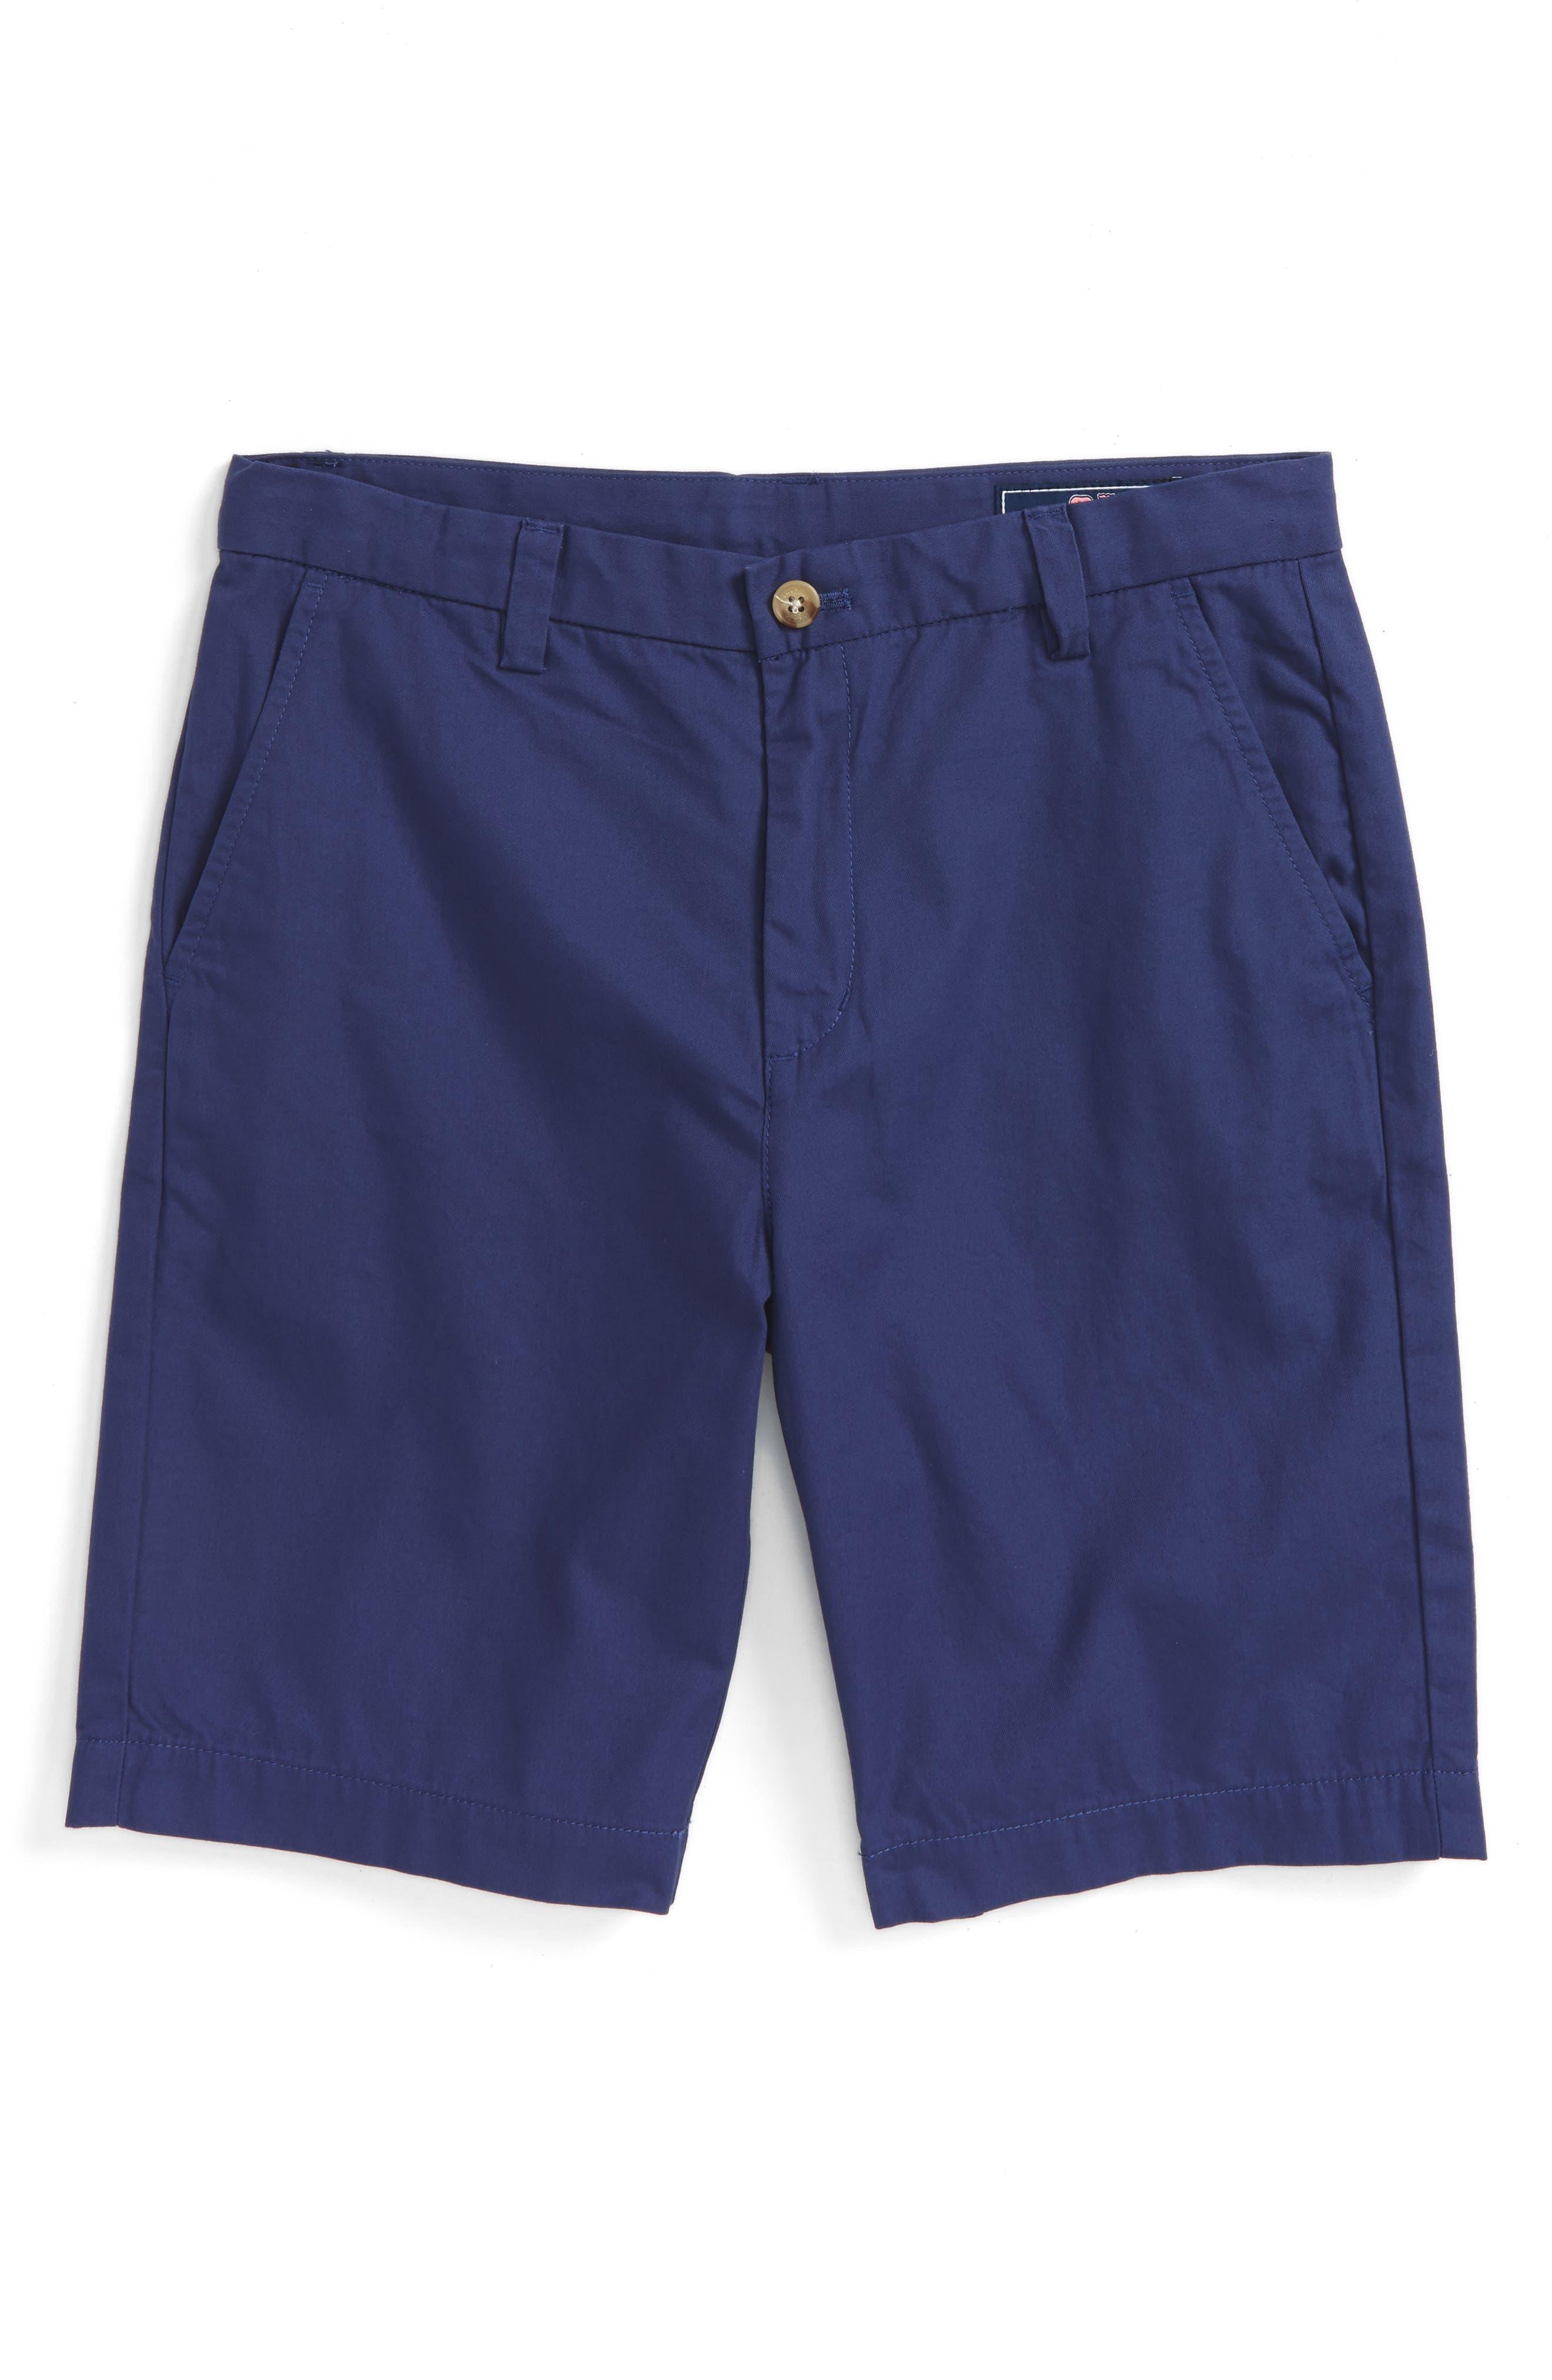 Summer - Breaker Twill Shorts,                         Main,                         color, Deep Cobalt